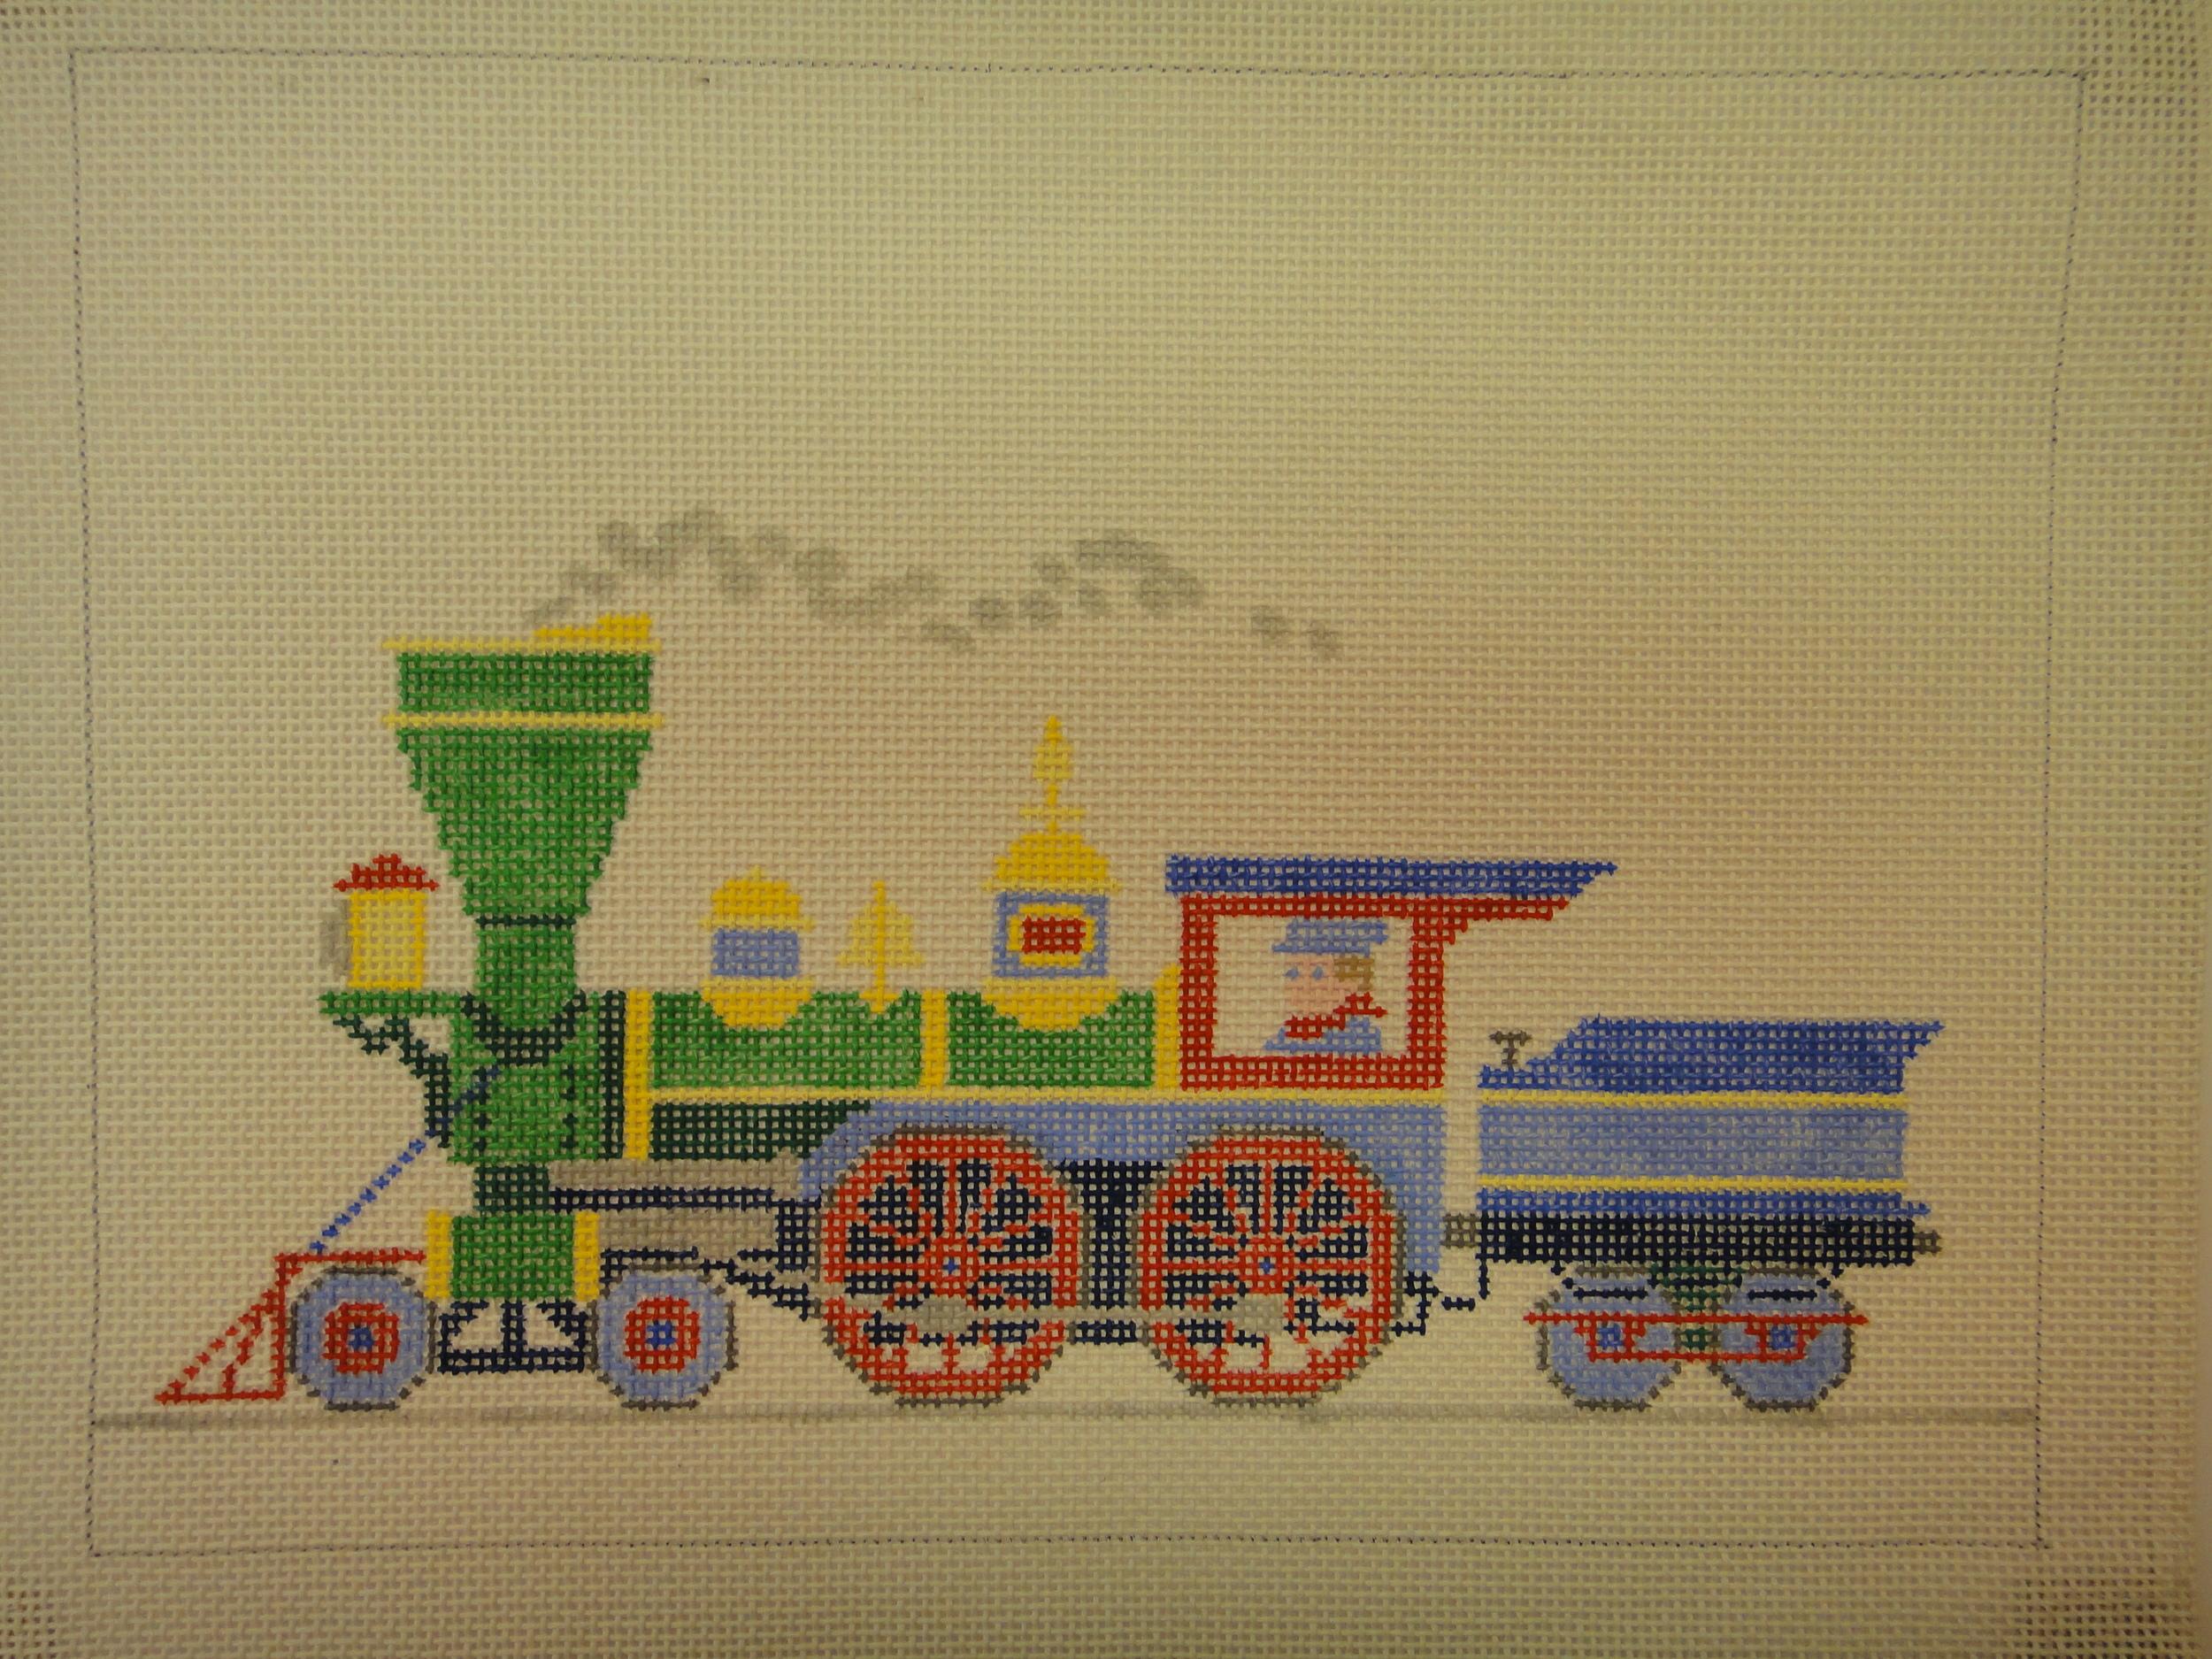 C24 Train Engine (12x9)